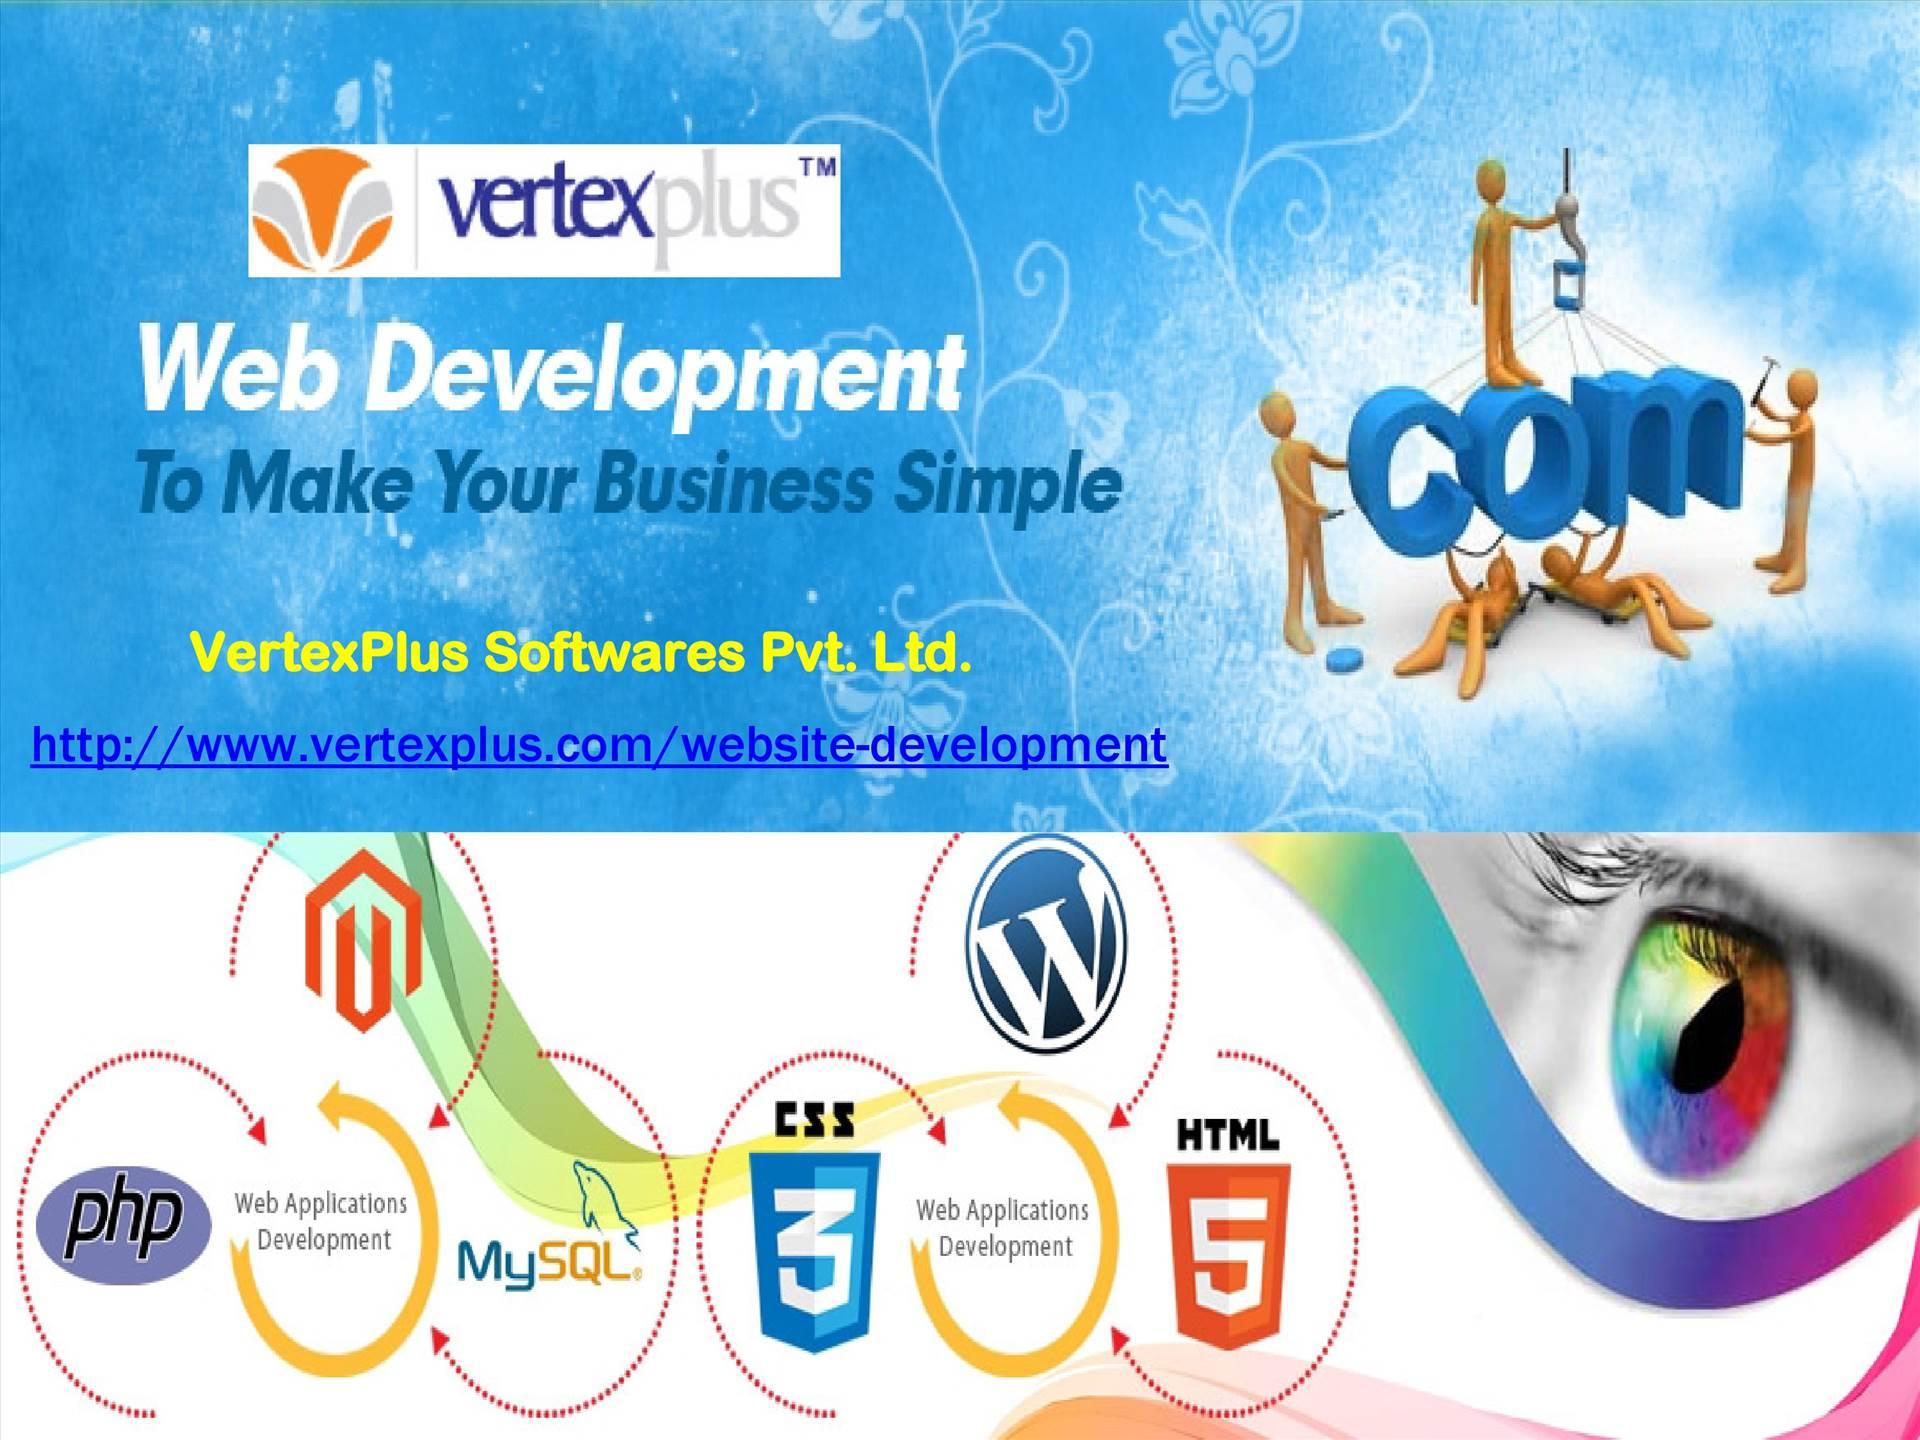 offshore website development company - Vertexplus Softwares.jpg  by vertexplus